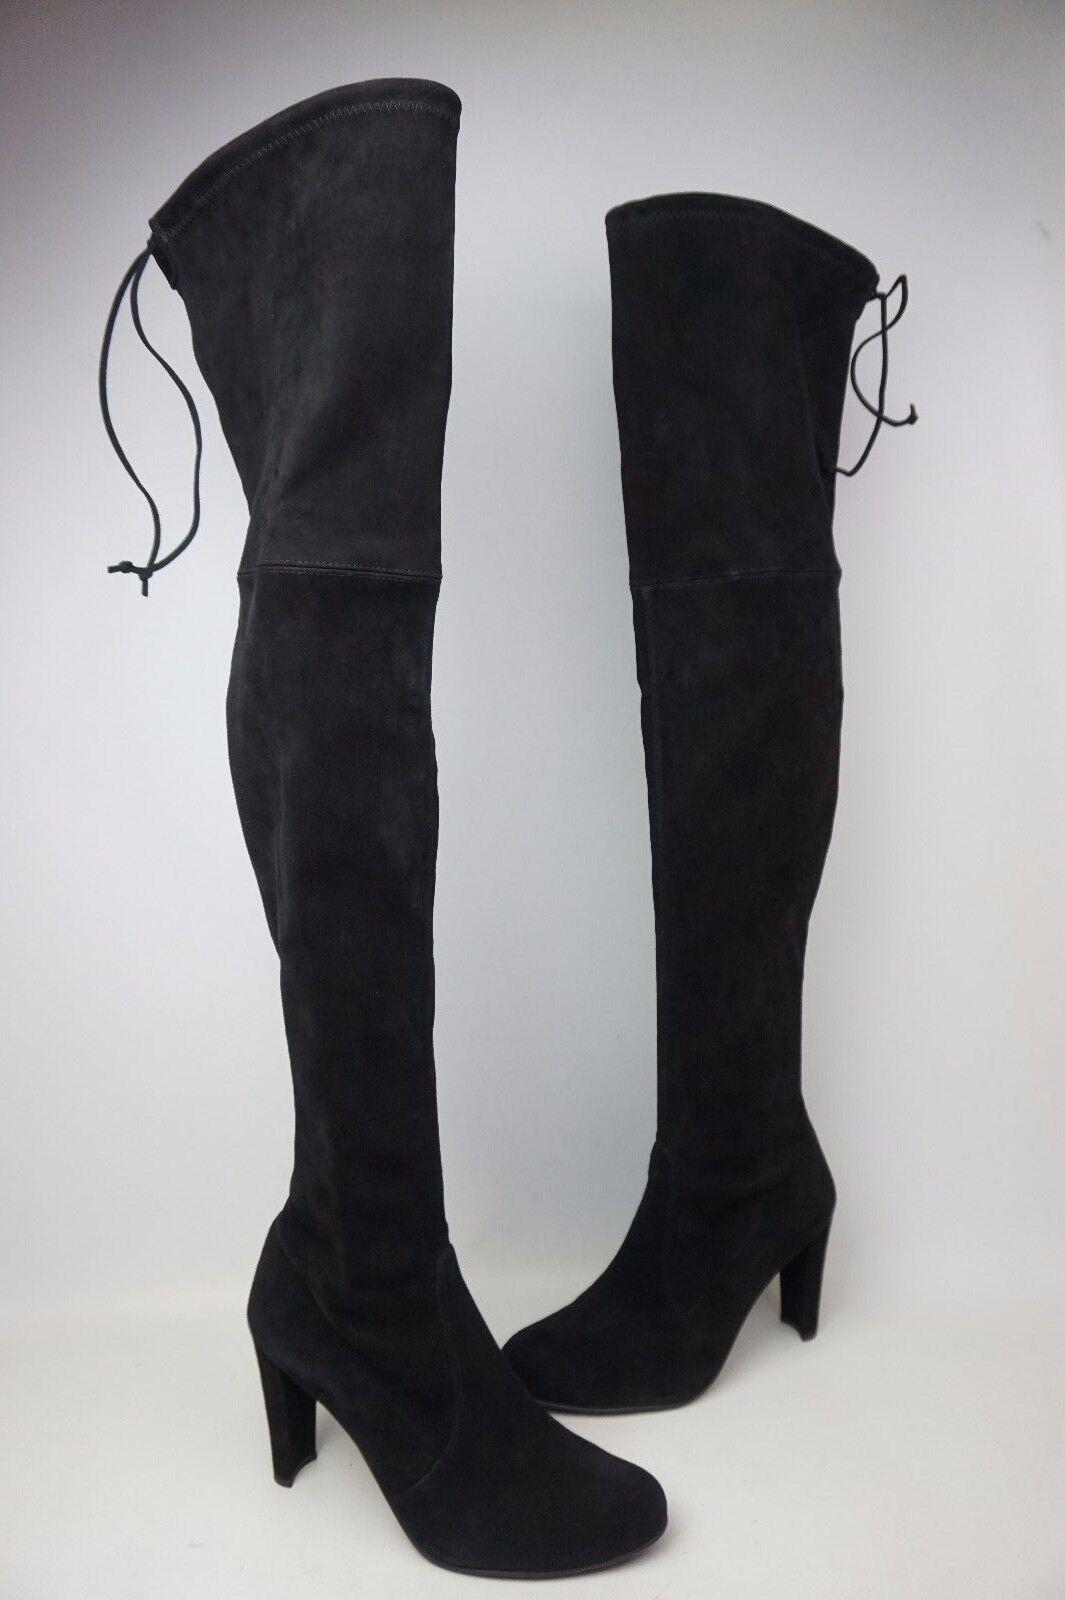 Stuart Weitzman Highland sobre la rodilla botas De De De Gamuza Negra Talla 11.5 M  venta caliente en línea